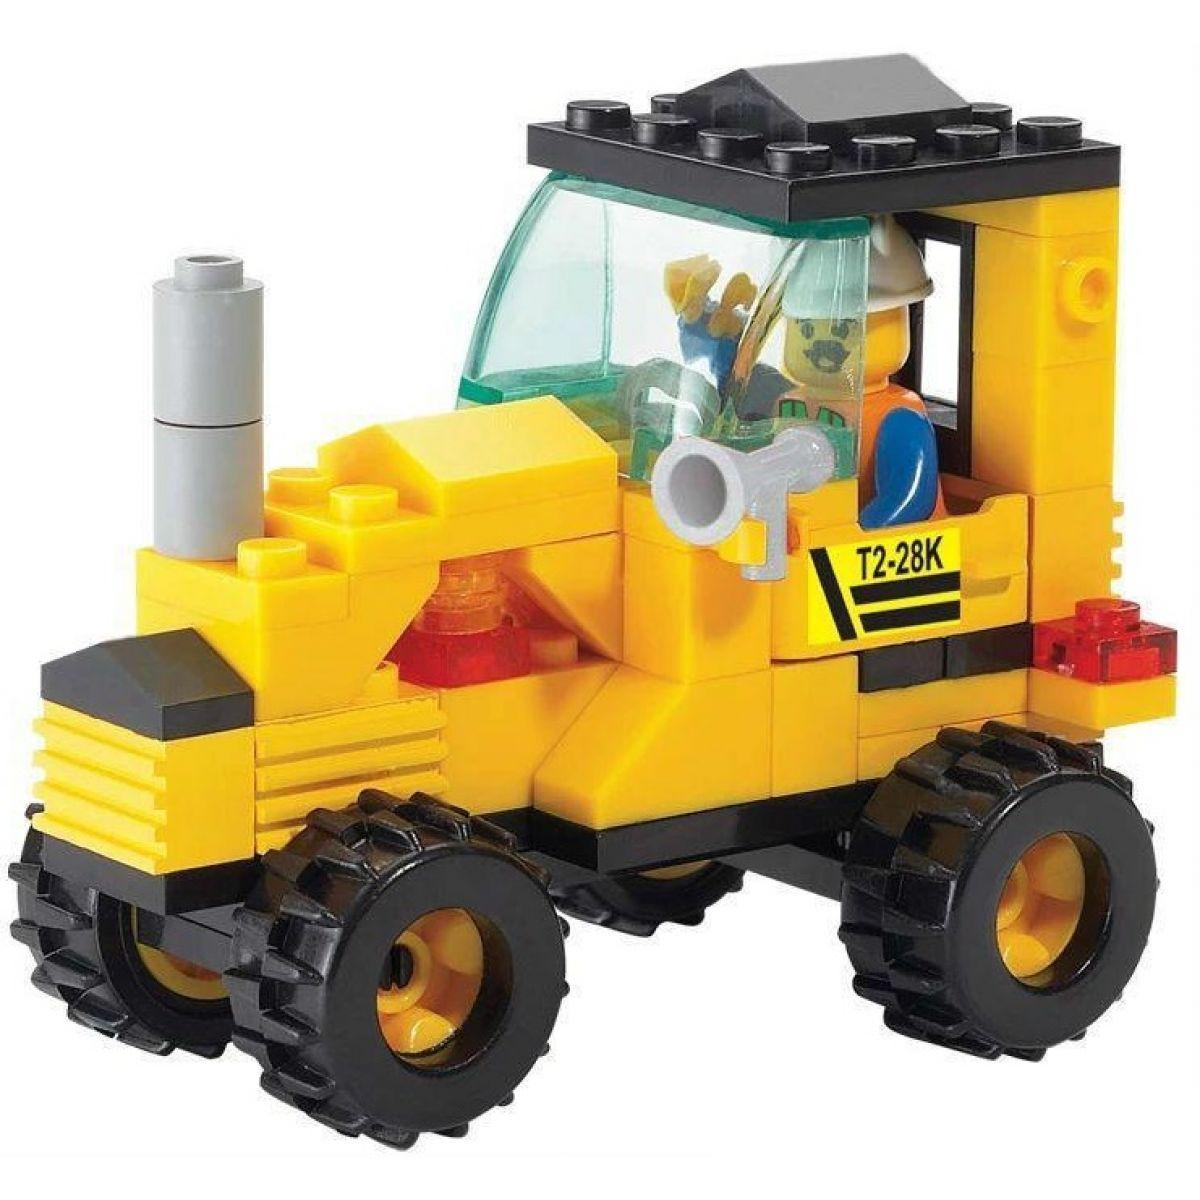 Sluban Stavebnice Traktor #2